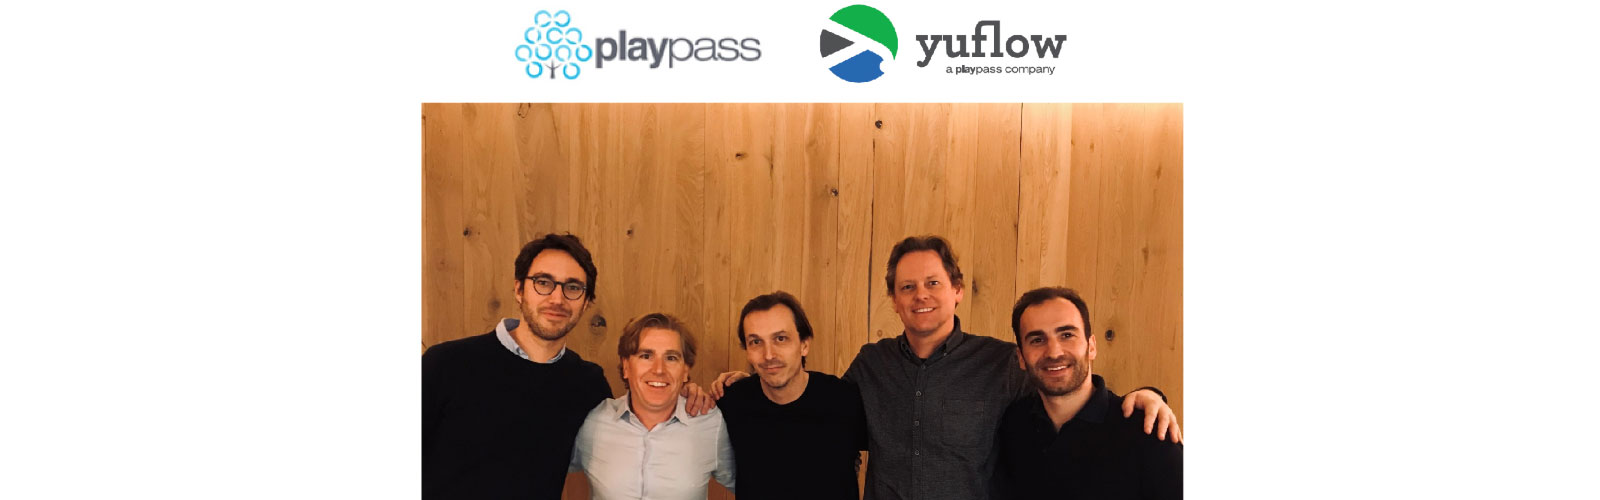 playpass-yuflow